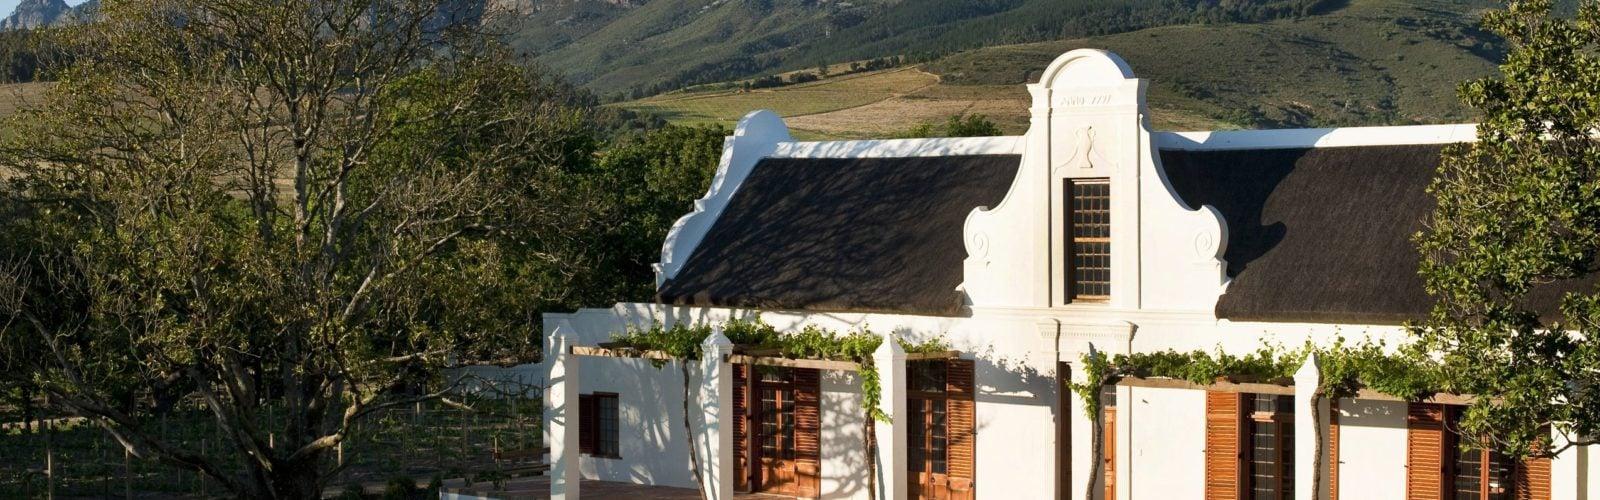 Exterior view, Babylonstoren, The Winelands, South Africa